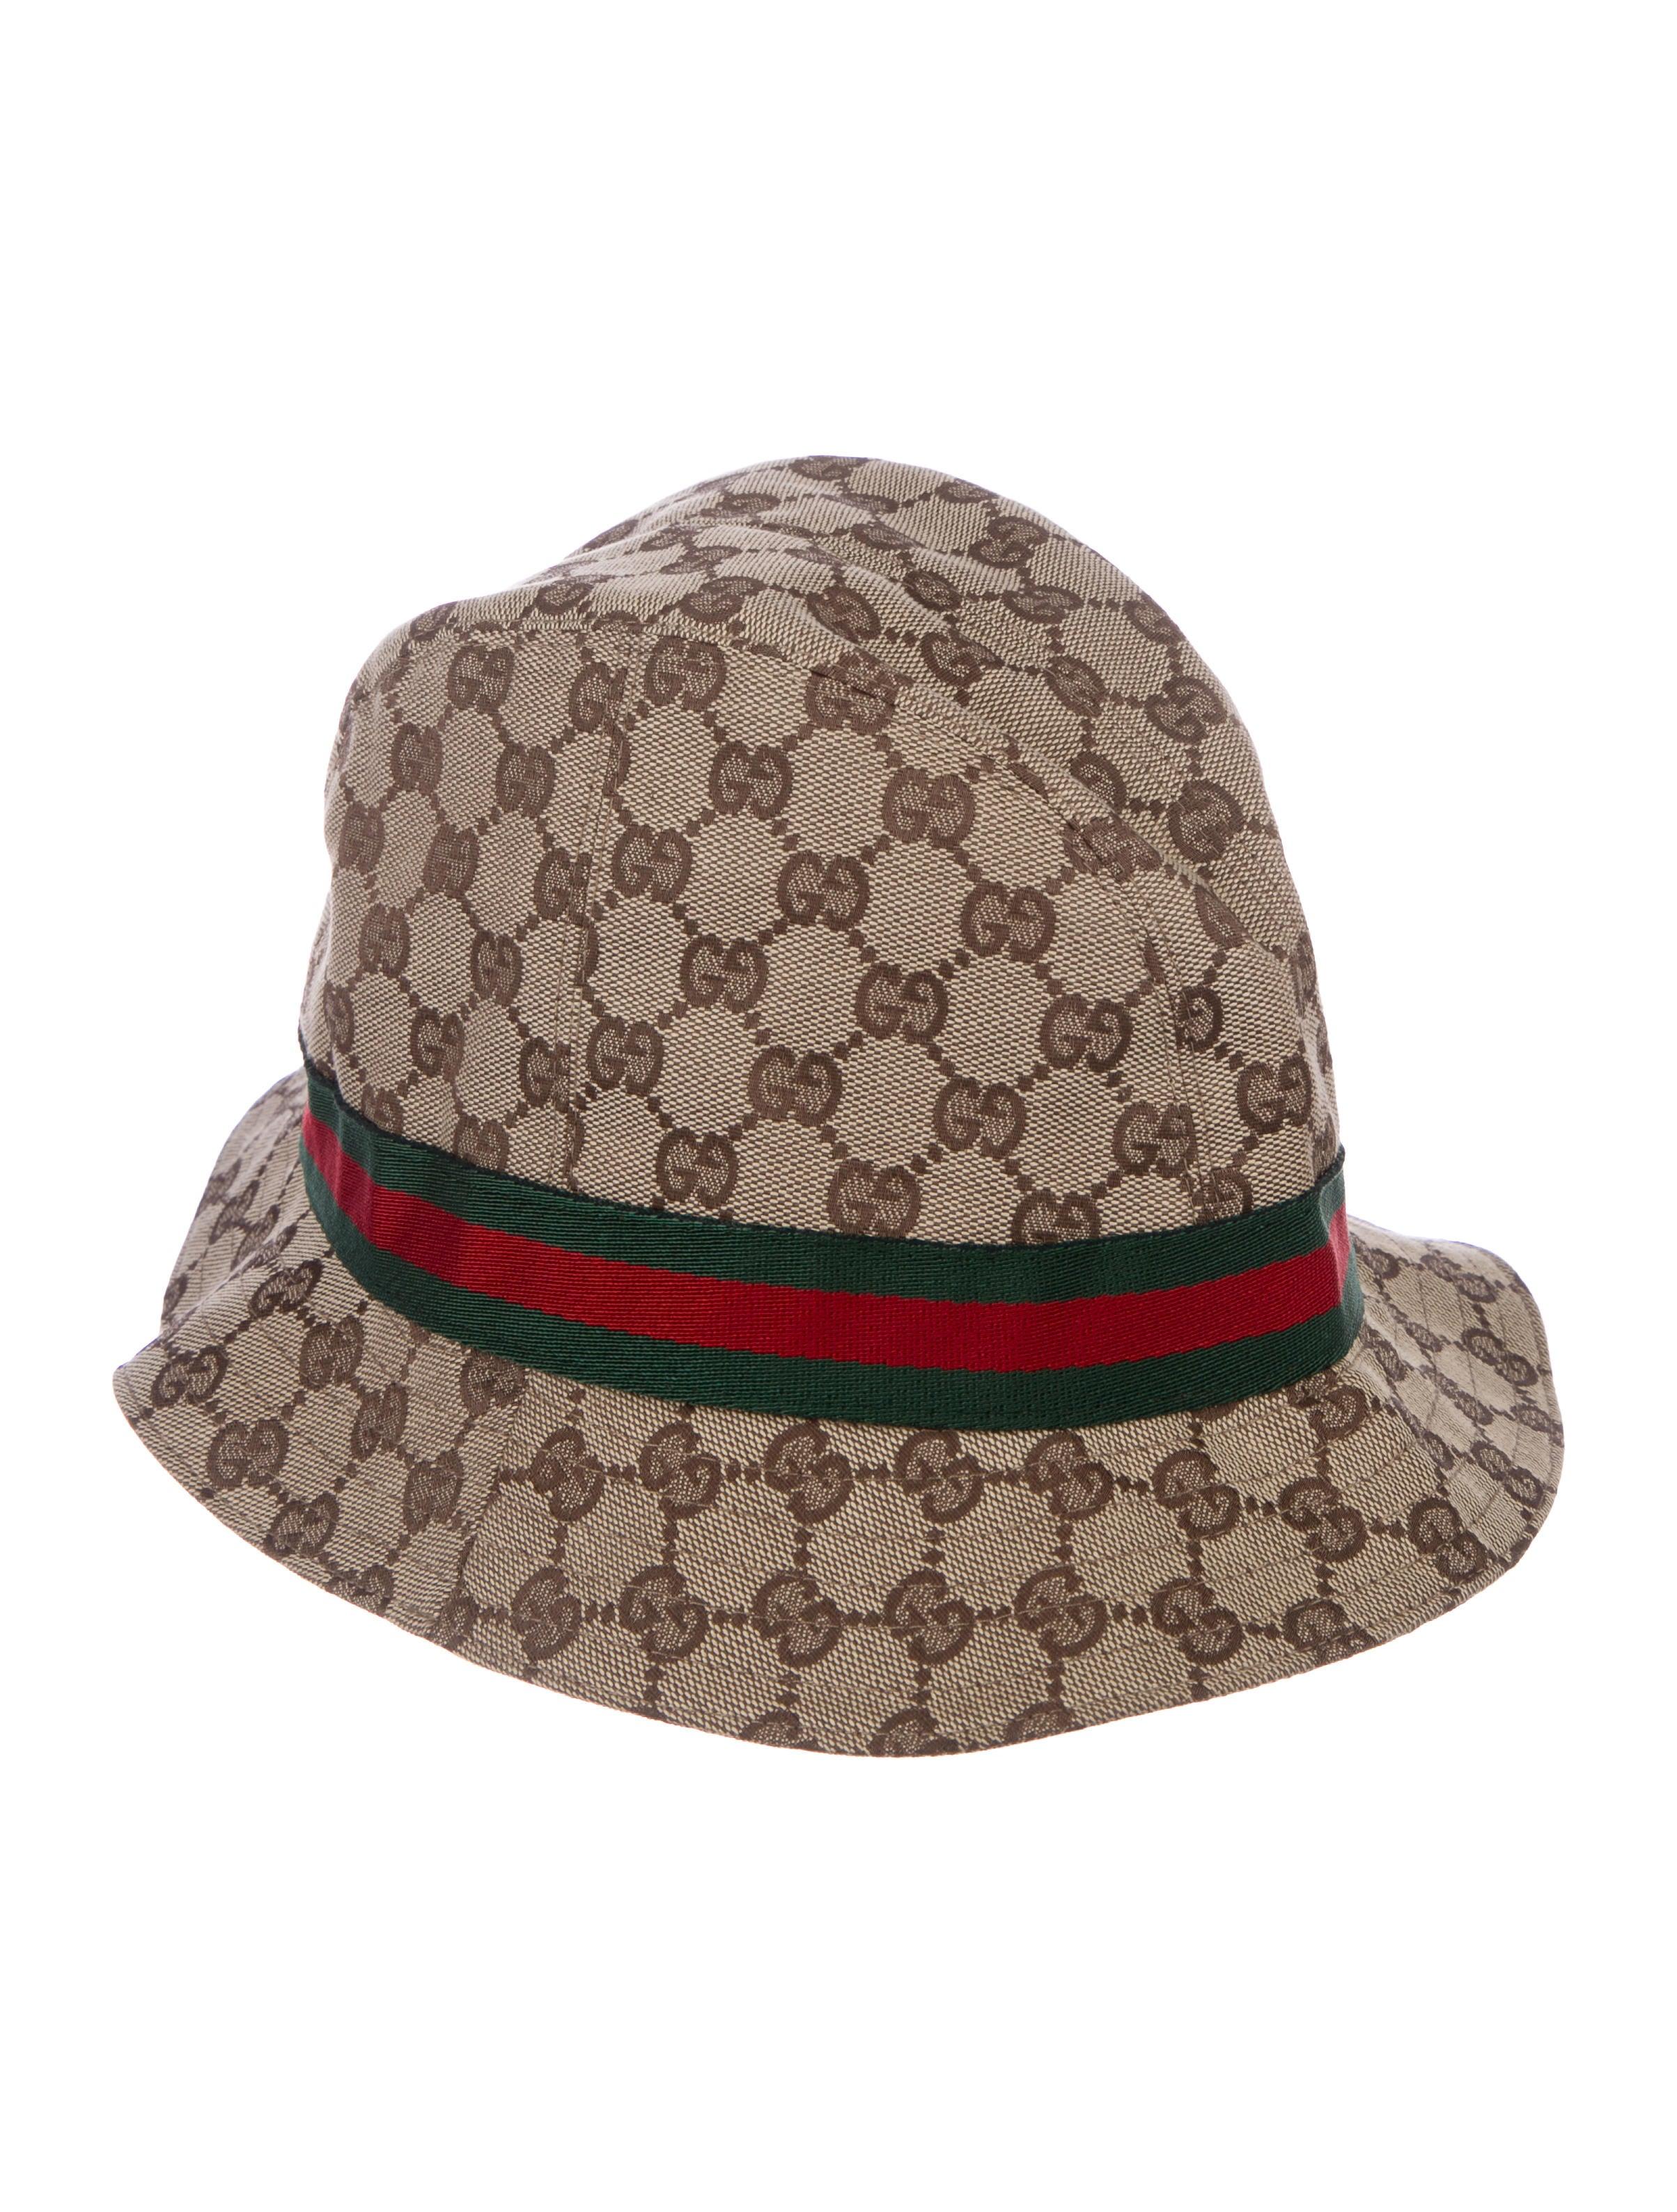 9d4bd9f62c7e Gucci GG Canvas Web-Accented Bucket Hat w  Tags - Accessories ...